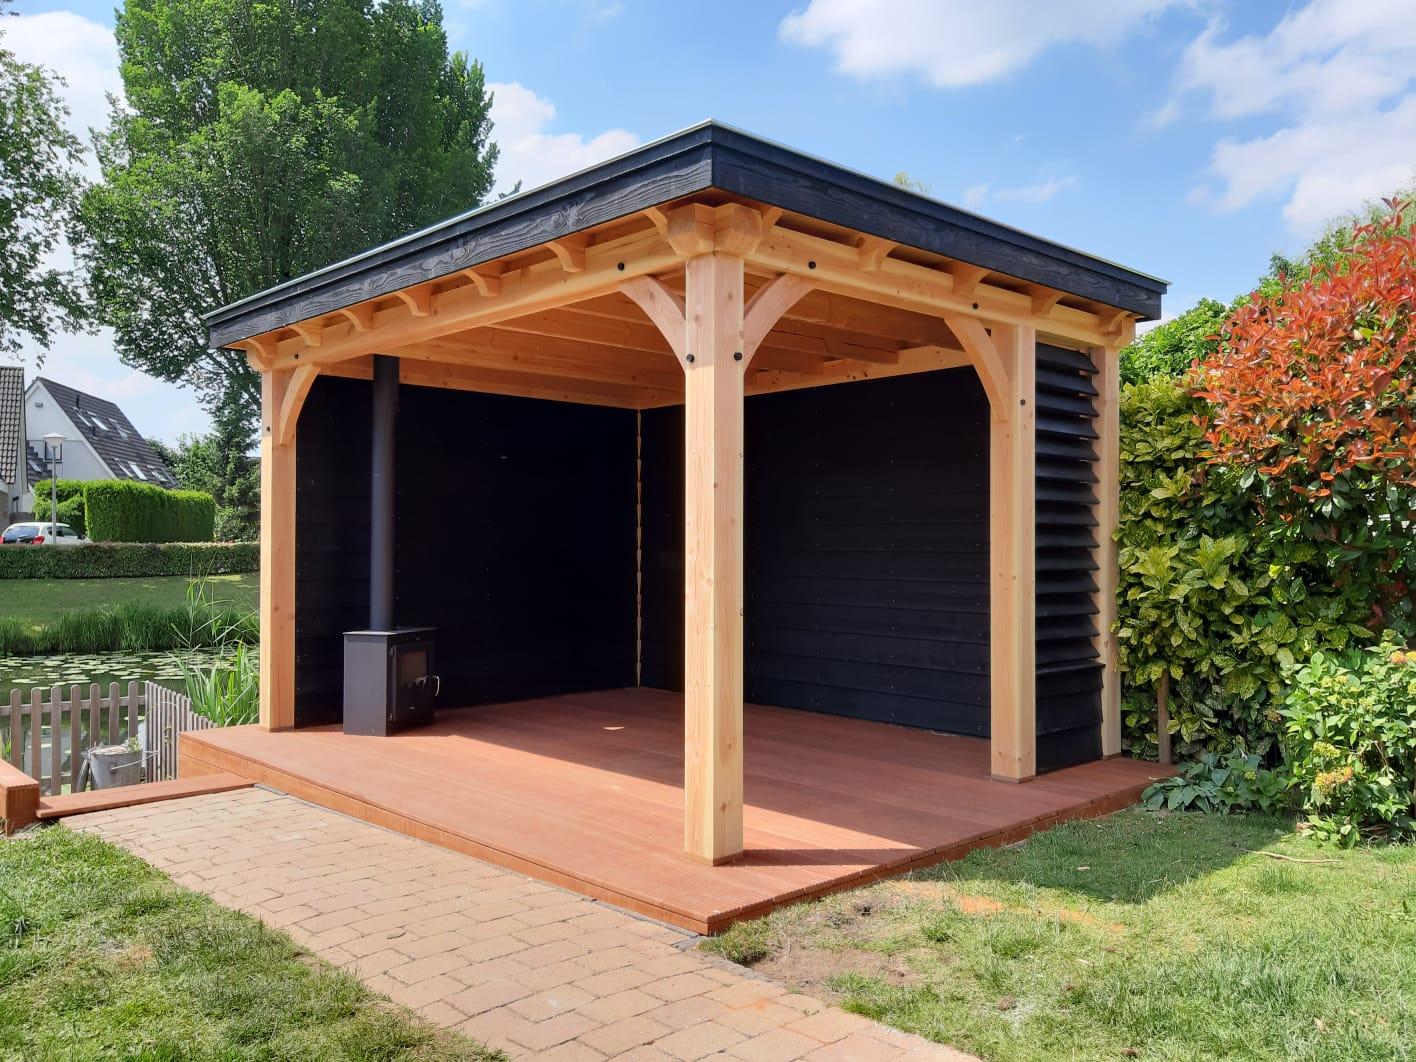 Douglas houten veranda met shutter